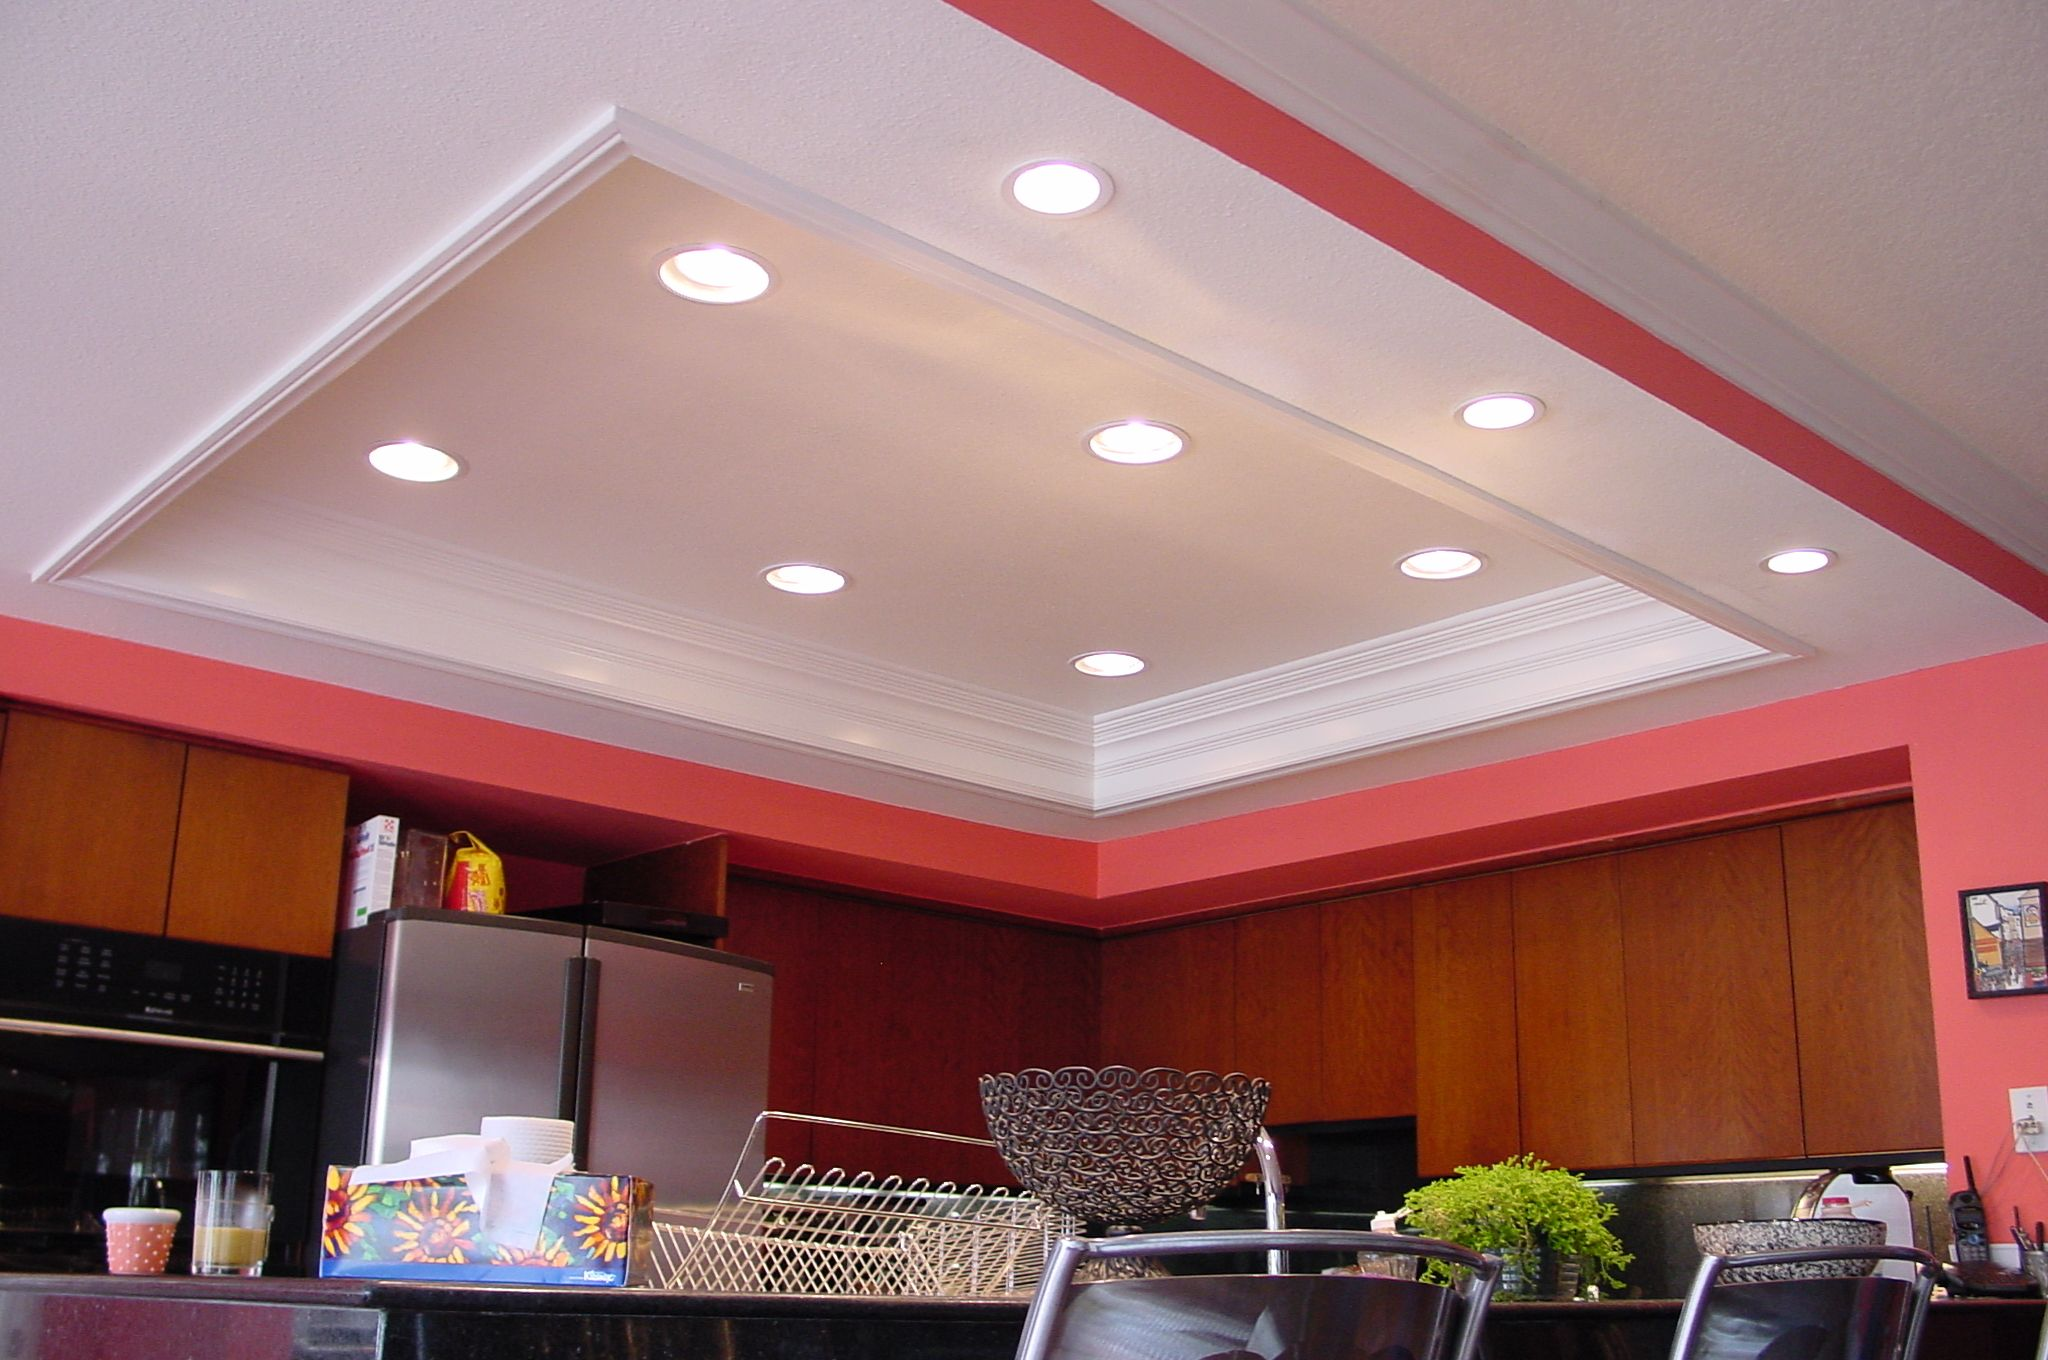 Kitchen Lighting Kitchen Recessed Lighting Recessed Lighting Fixtures Kitchen Lighting Design